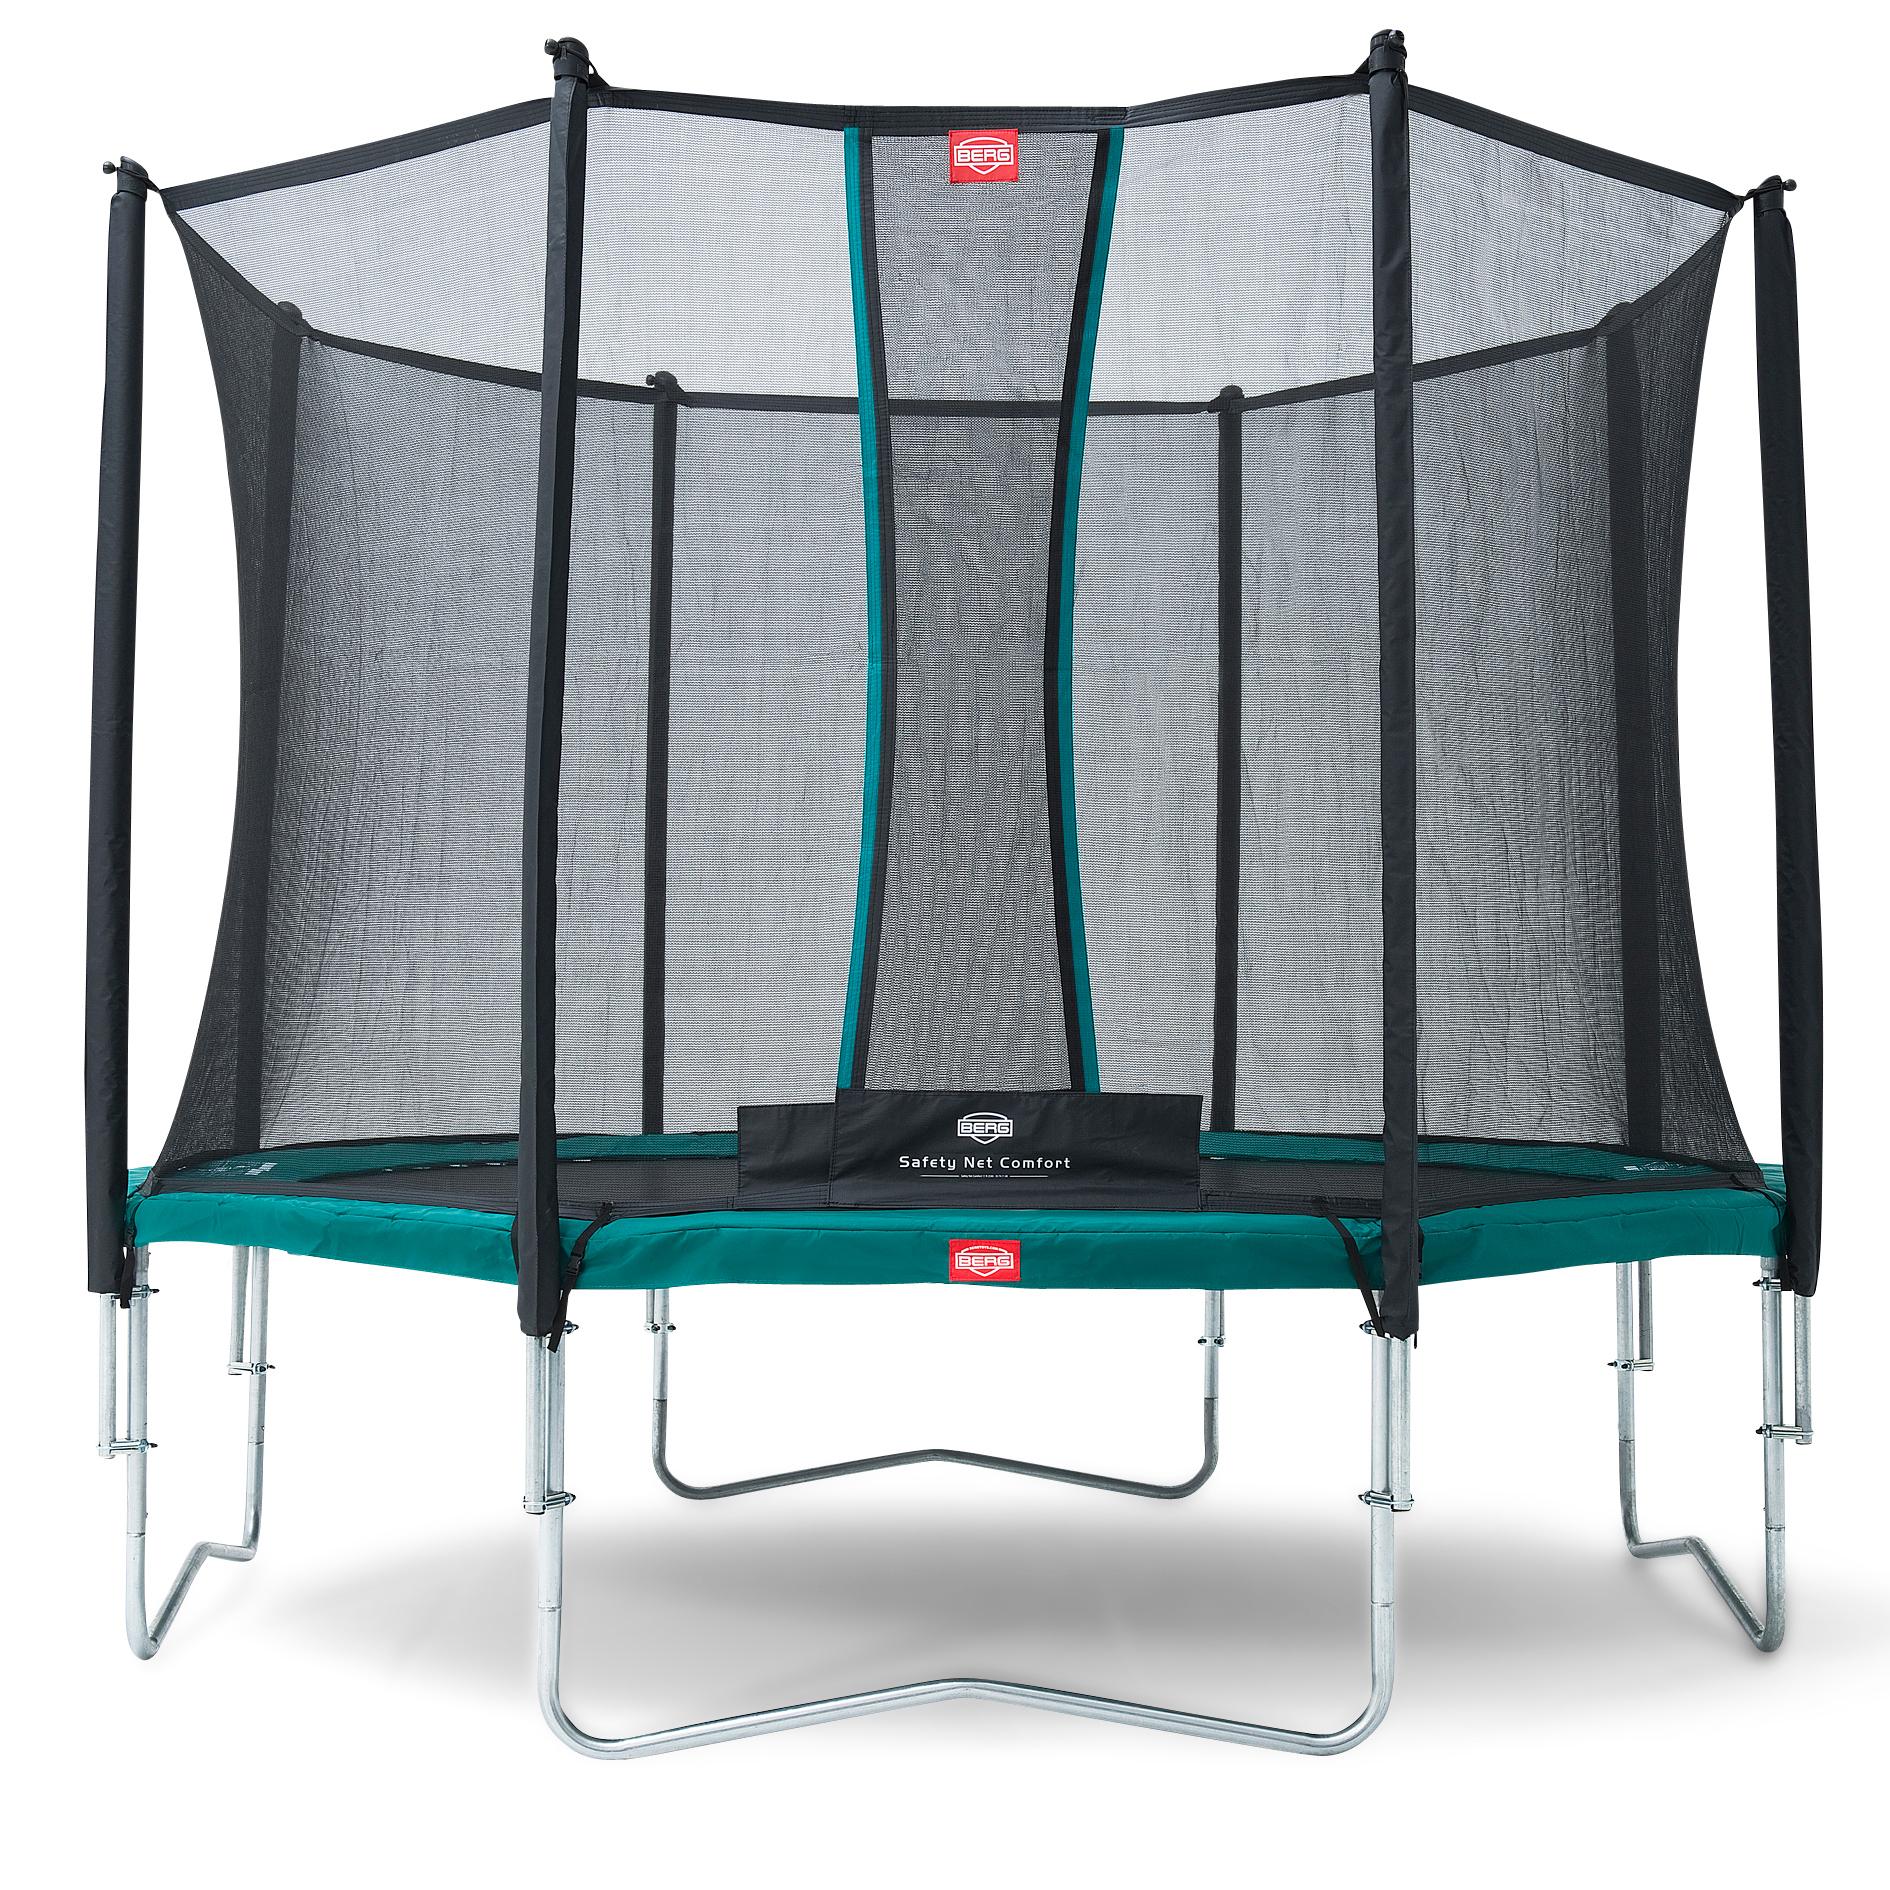 Berg trampolin med net - Favorit - Ø 380 cm - Grøn